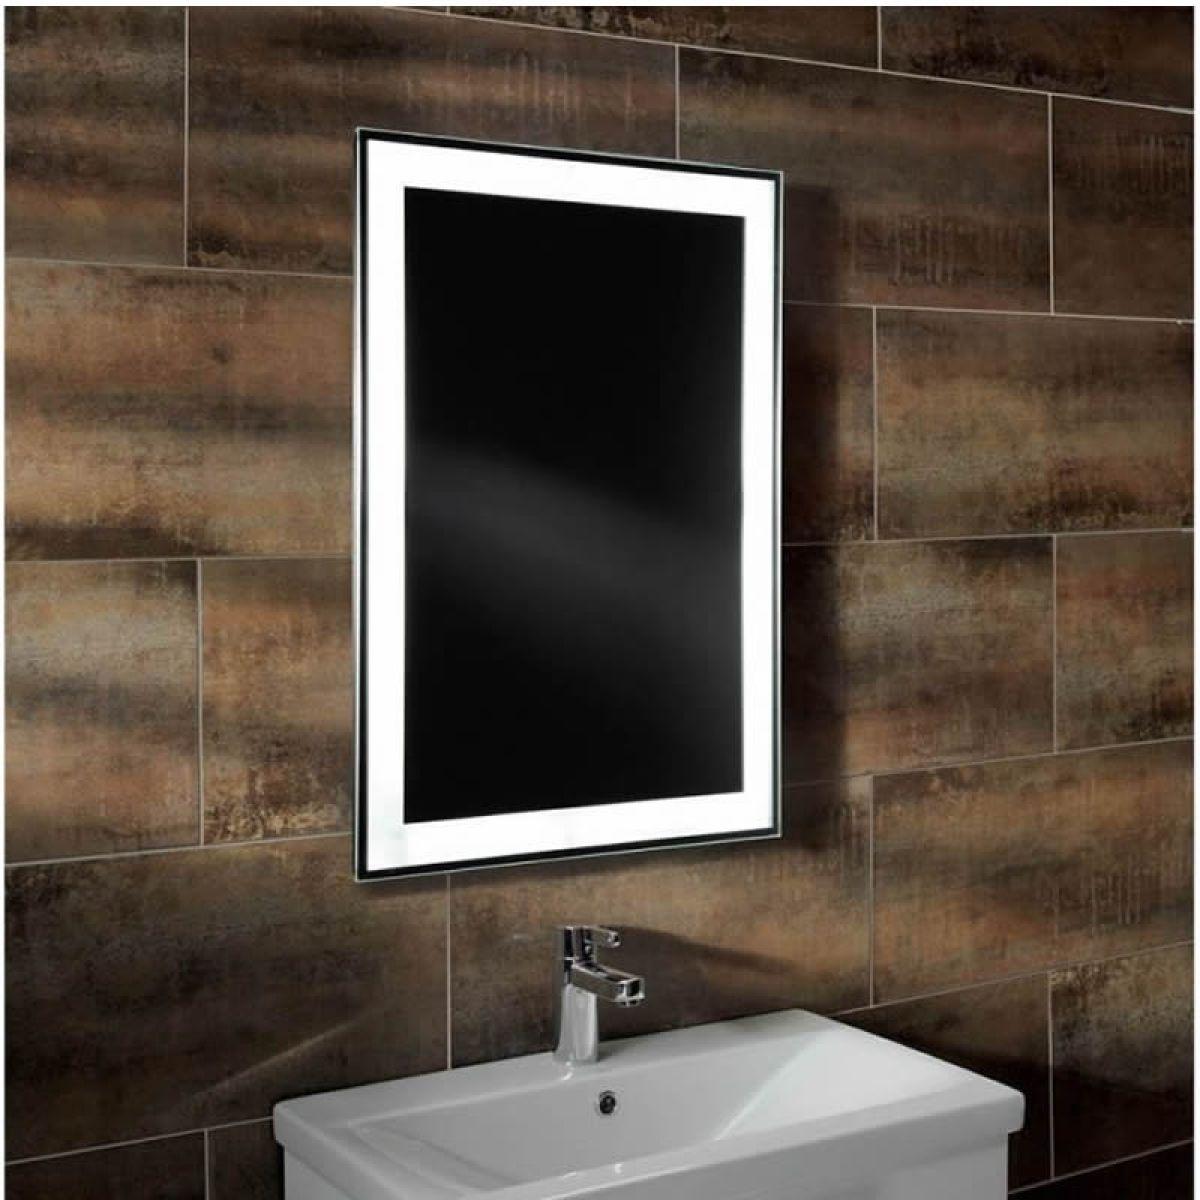 roper rhodes clarity status backlit heated mirror mlb280